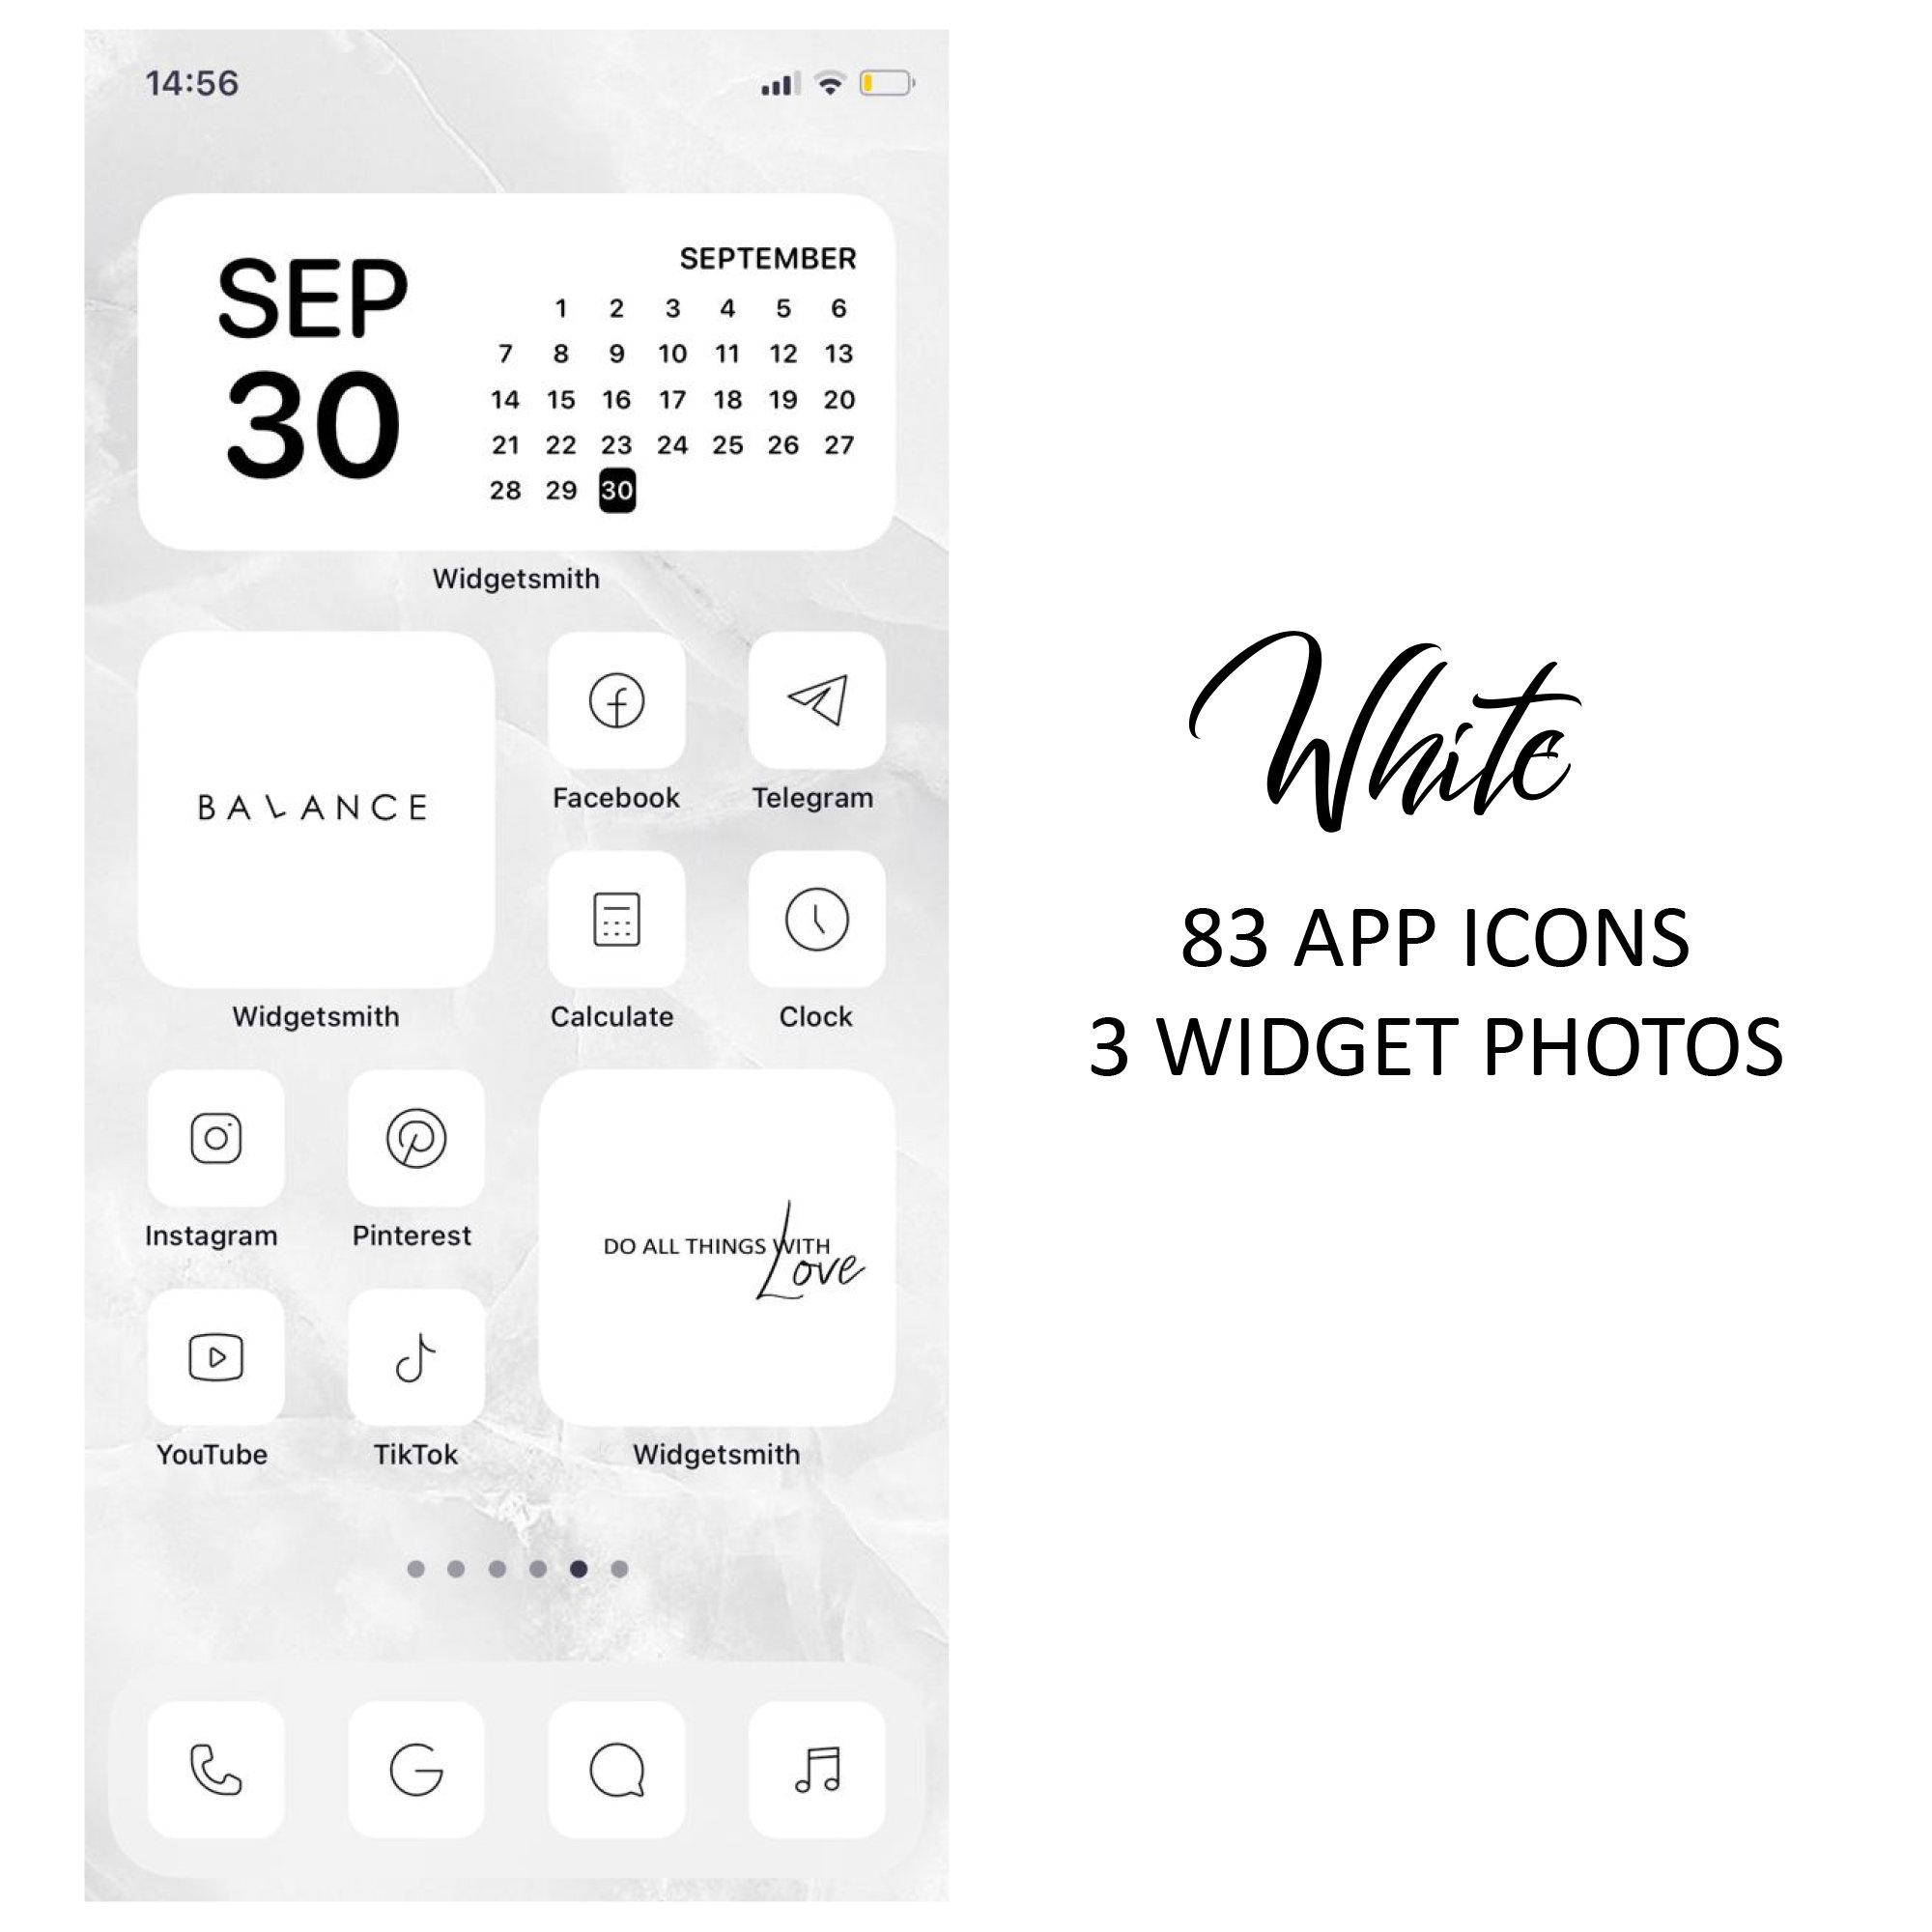 21 White iOS 21 App Icons Light Mood iOS21 Widget Cover Widgetsmith  Aesthetic Minimal Pack Iphone Apple Icons Set Shortcut Aesthetic